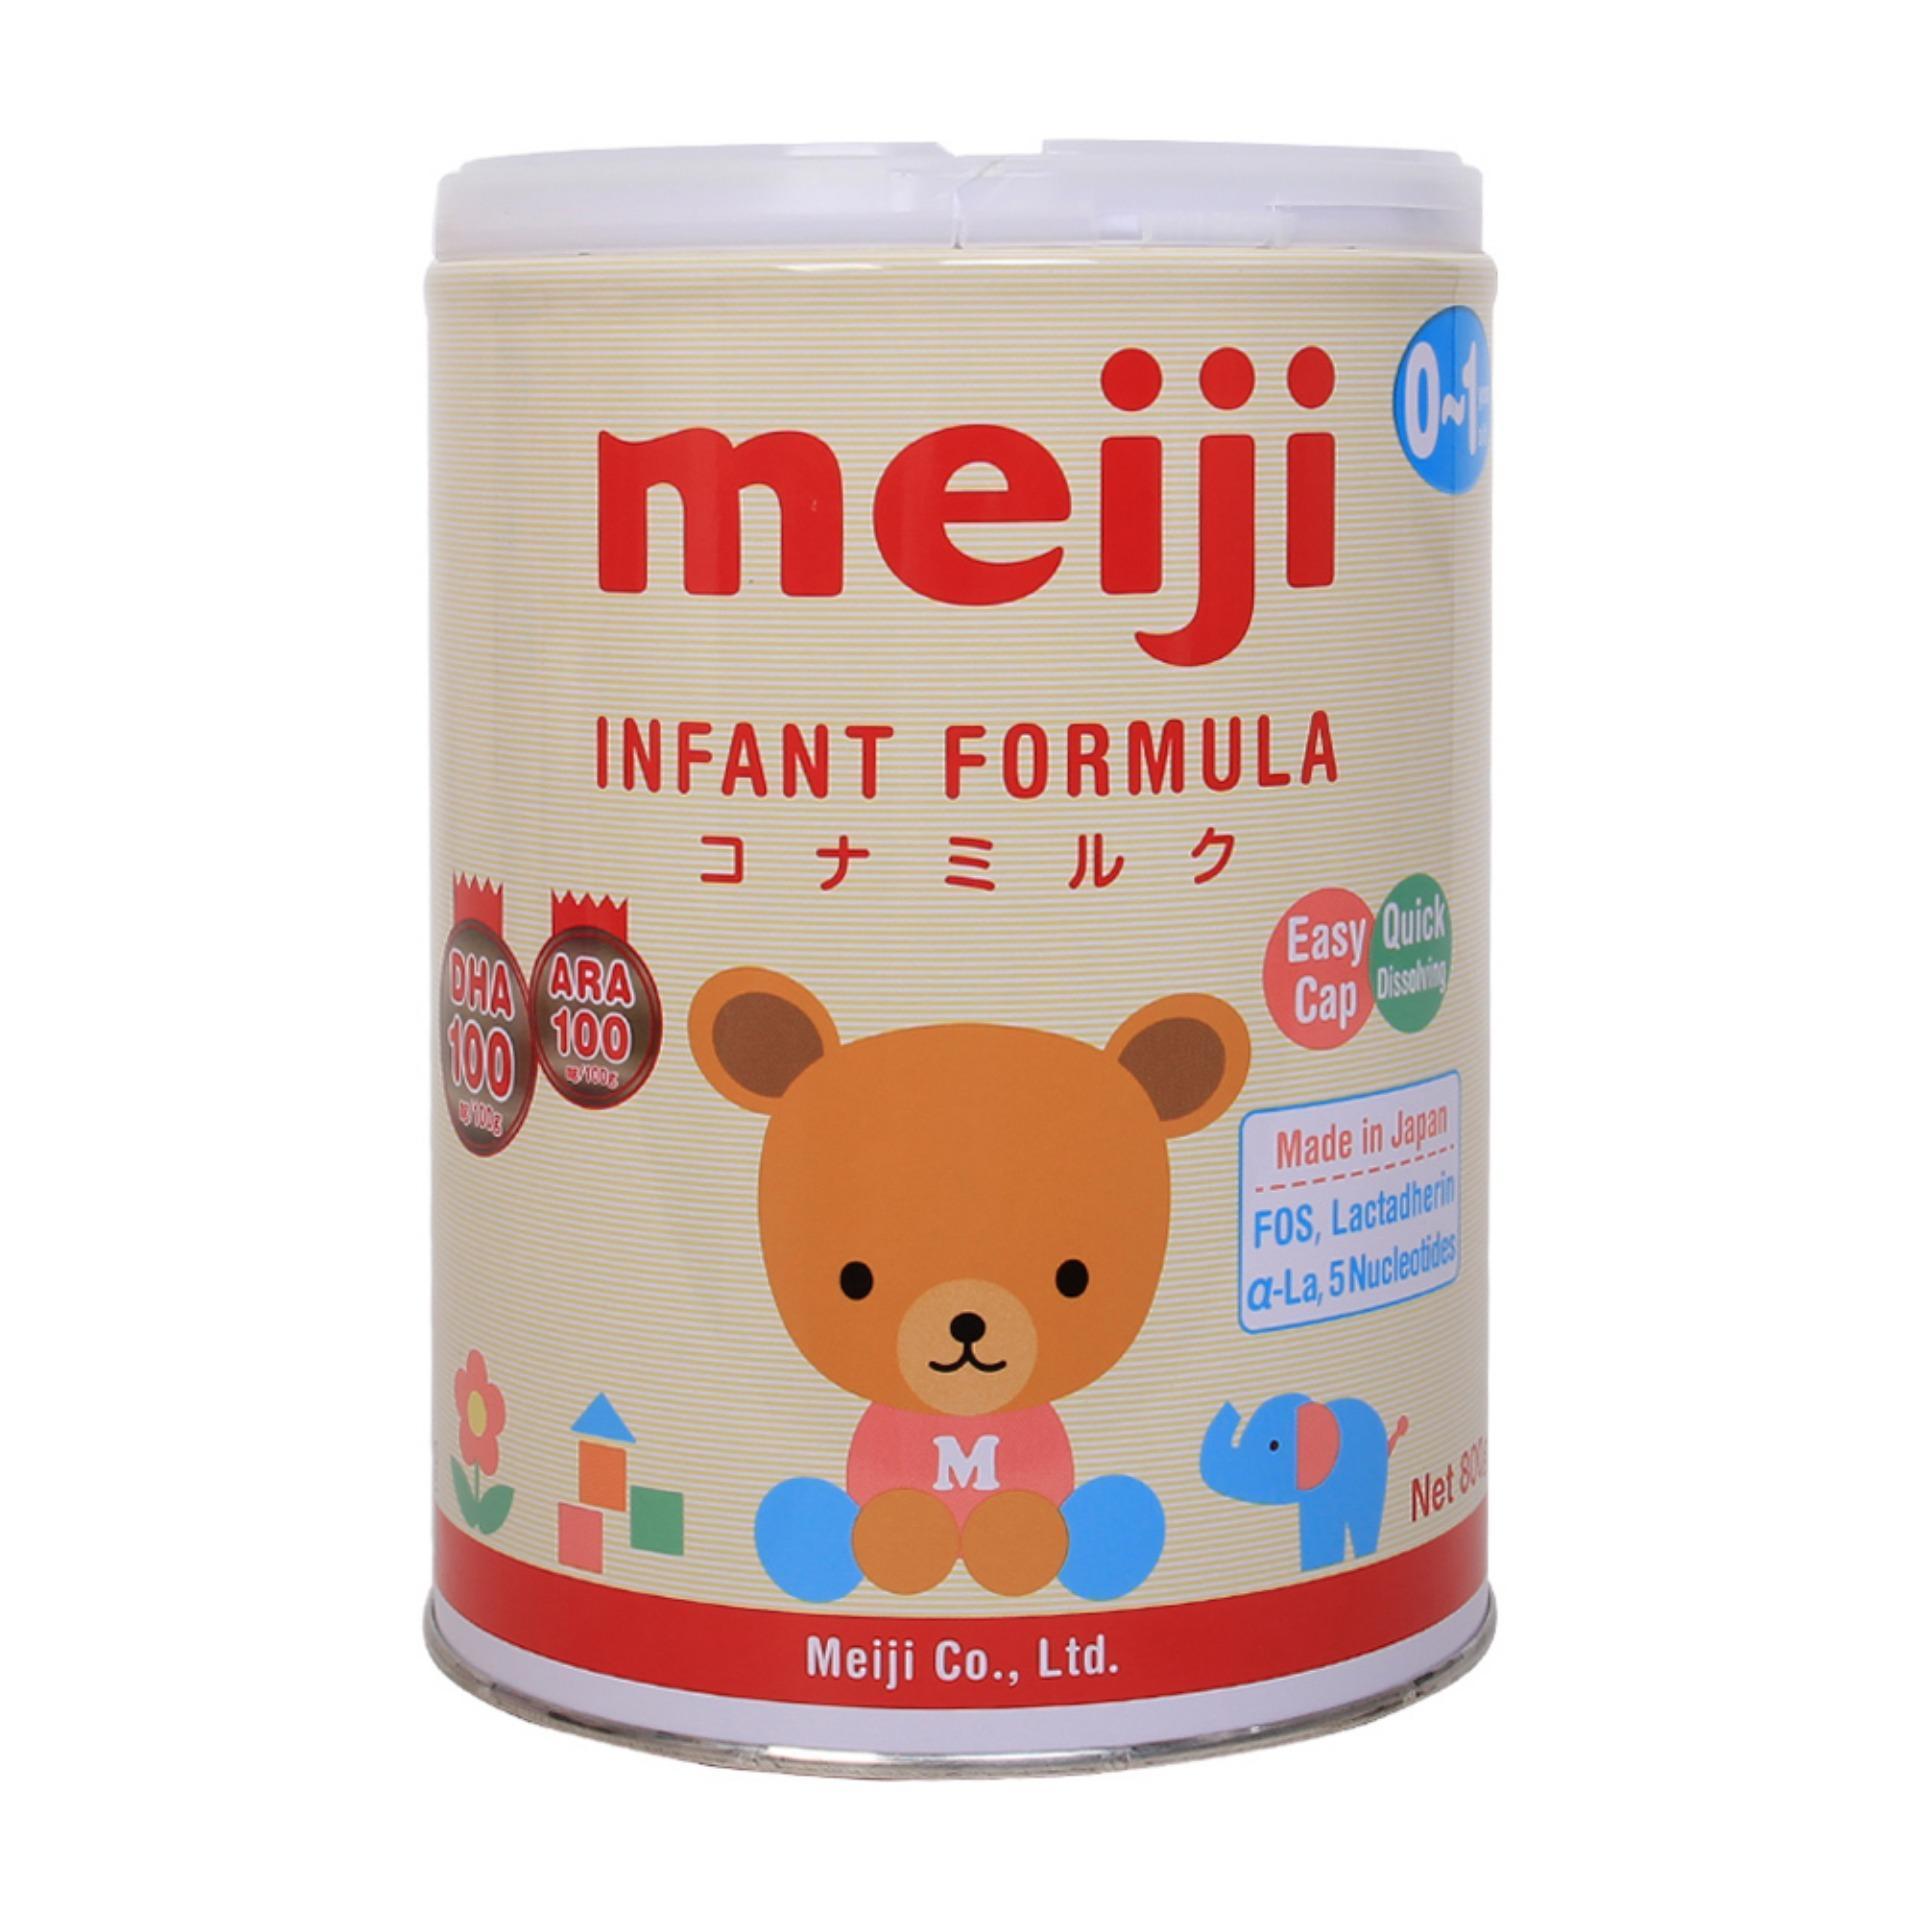 Sữa Meiji cho bé 0-1 tuổi 800g